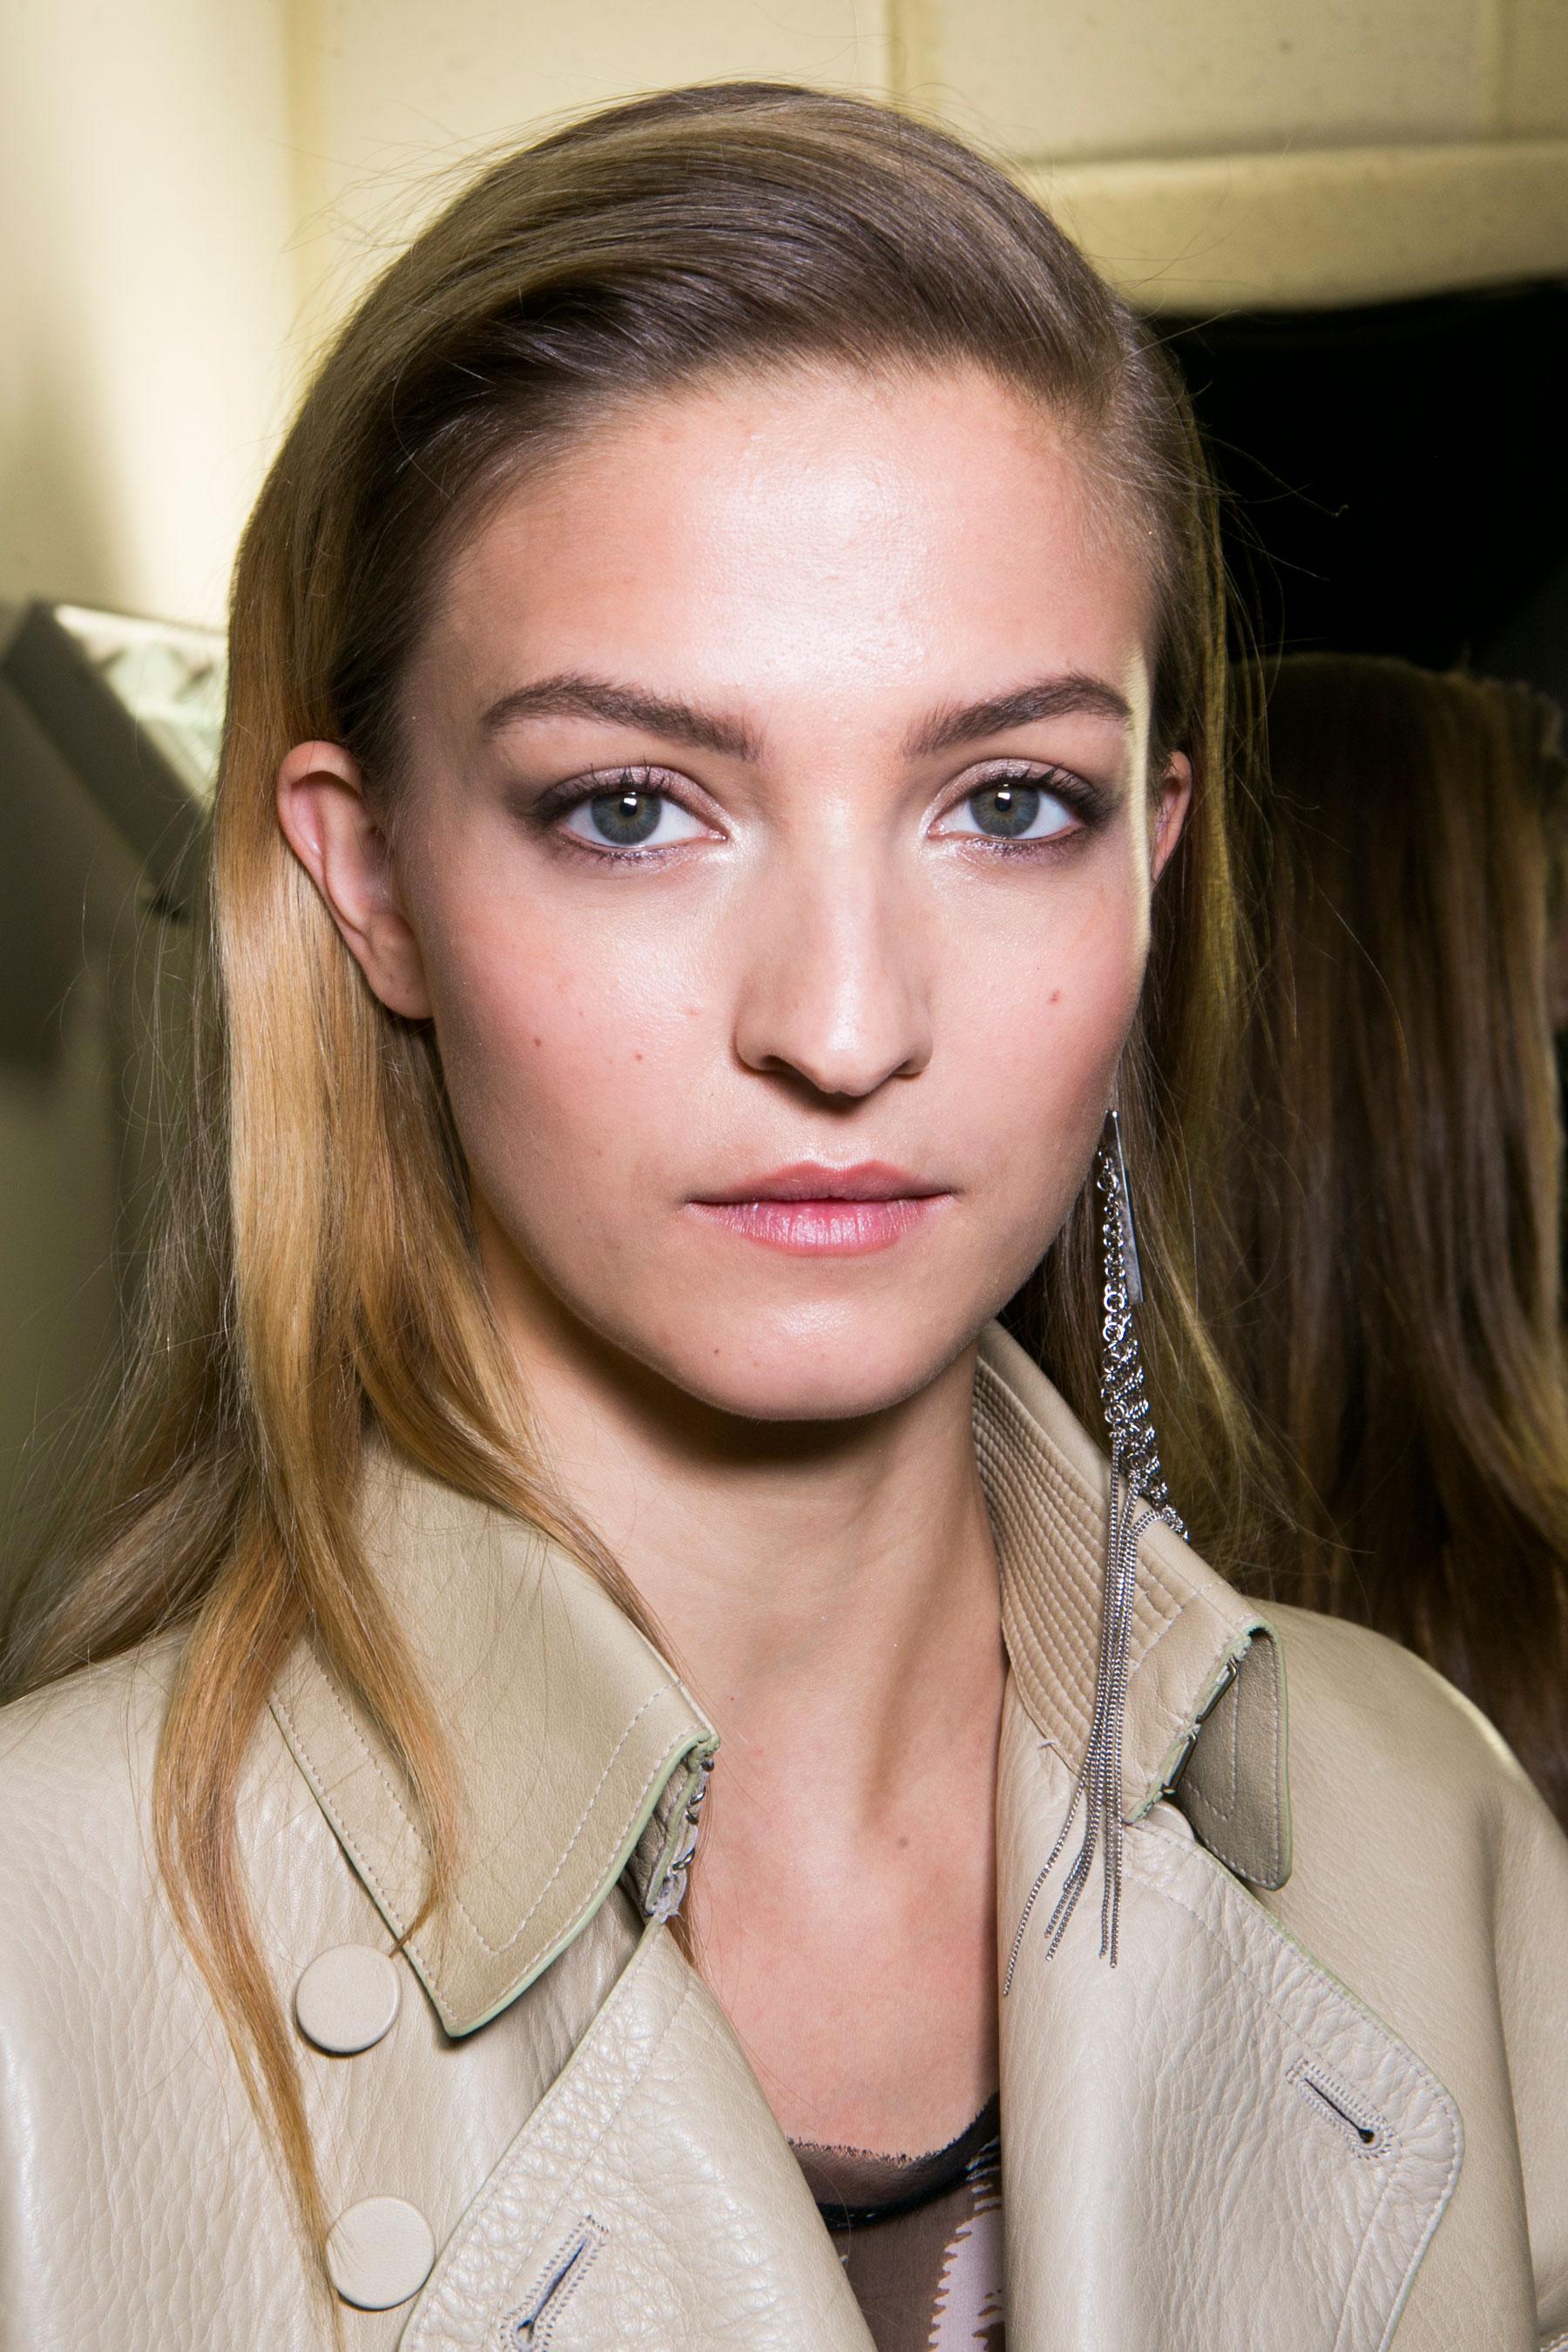 Roberto-Cavalli-Backstage-beauty-spring-2016-close-up-fashion-show-the-impression-049